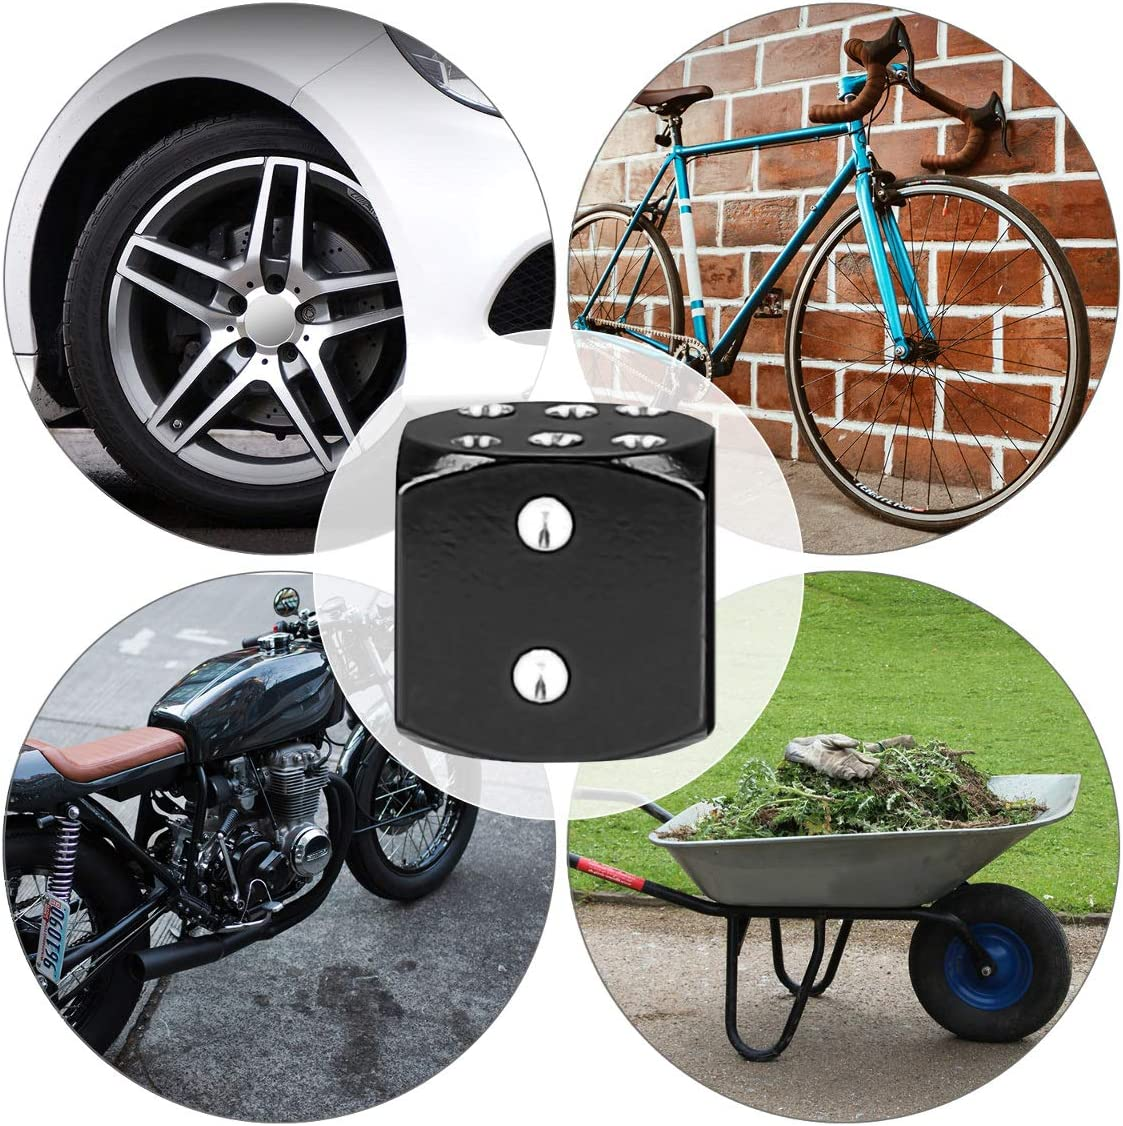 Fliyeong Premium Quality Dust Caps 4x Metal Dice Bike Car Motorcycle ATV Tyre Tire Wheel Valve Dust Caps Covers Black